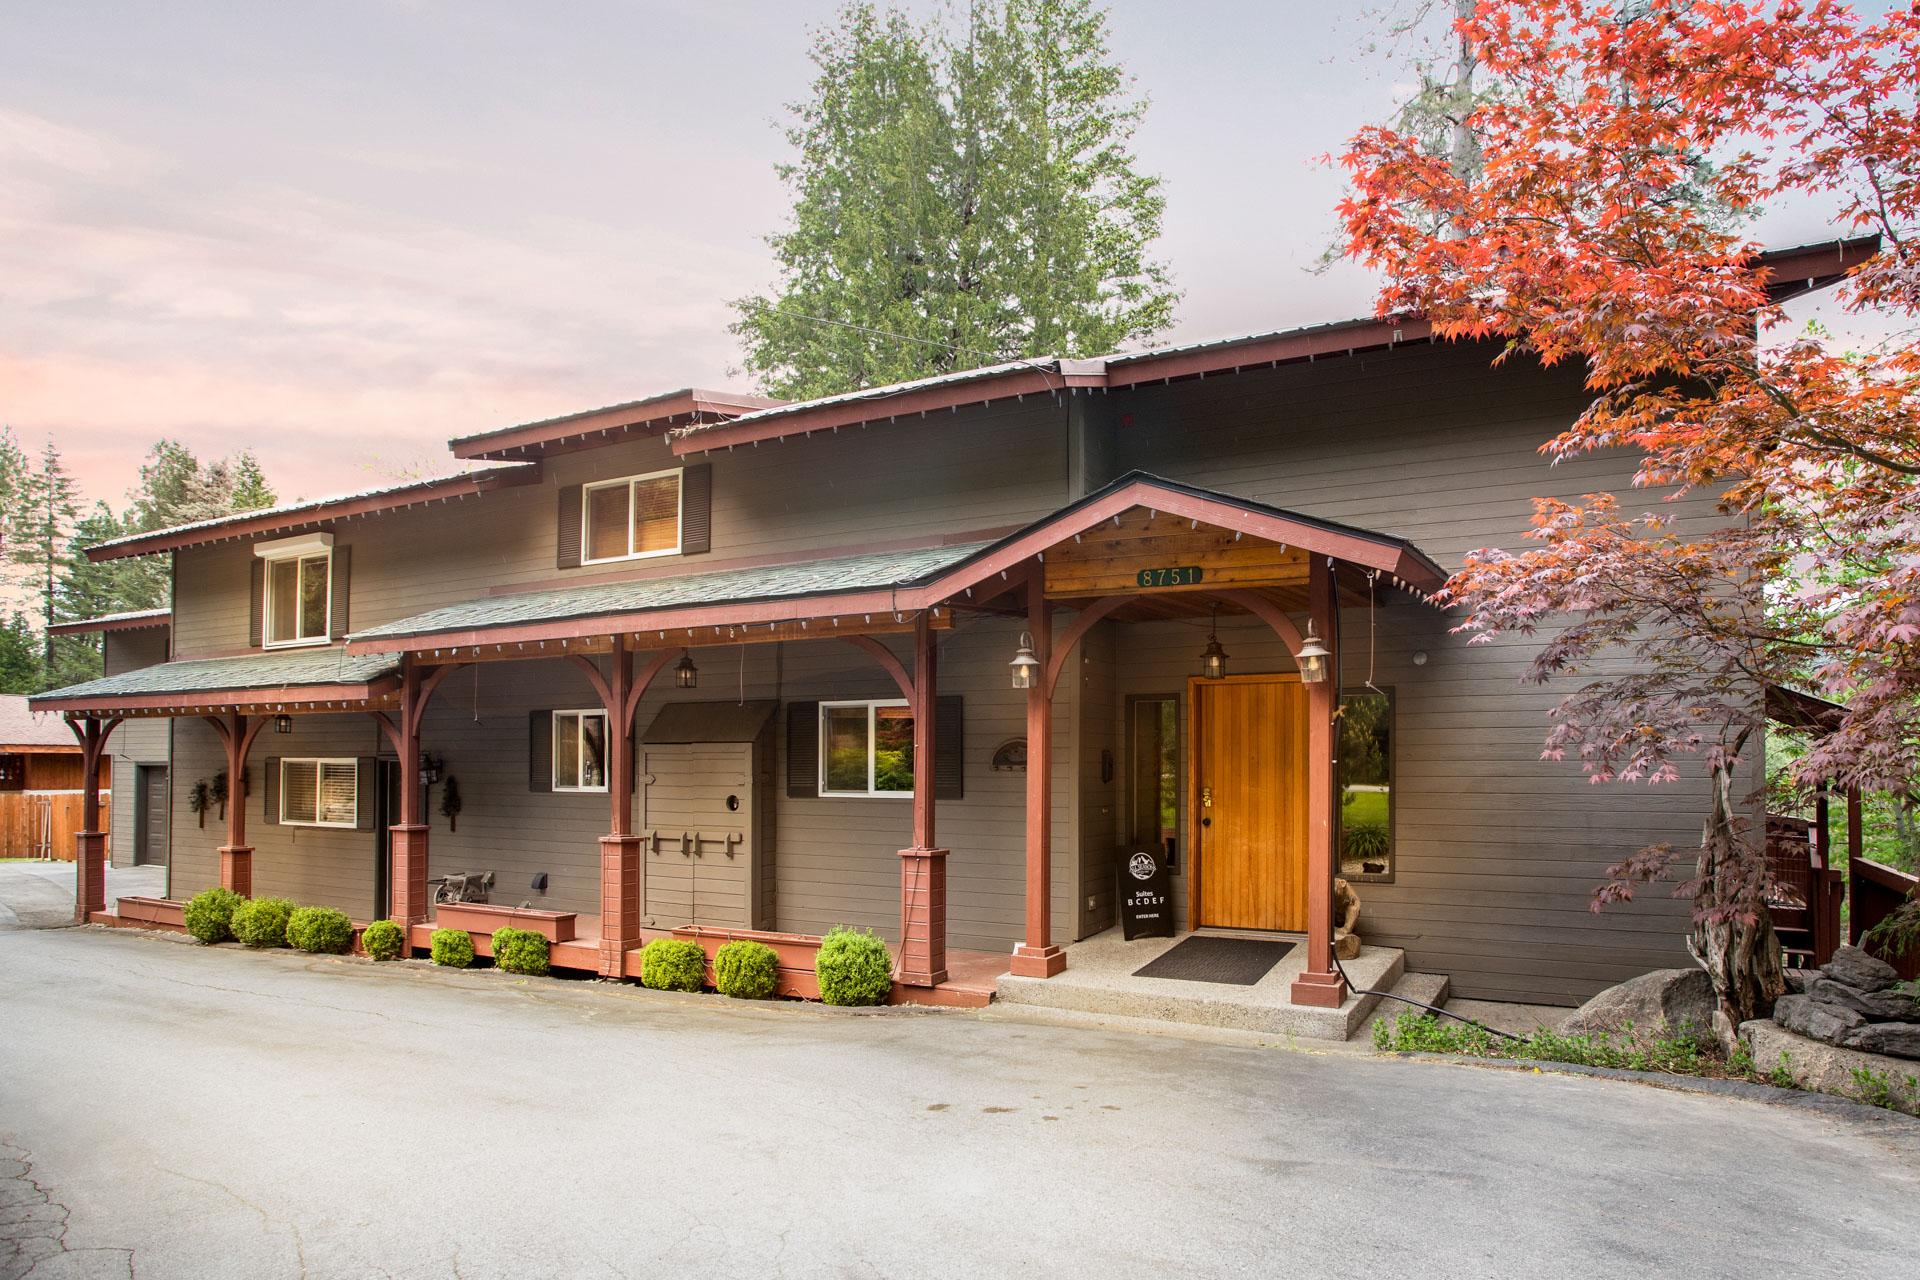 leavenworth vacation rental - all seasons river inn